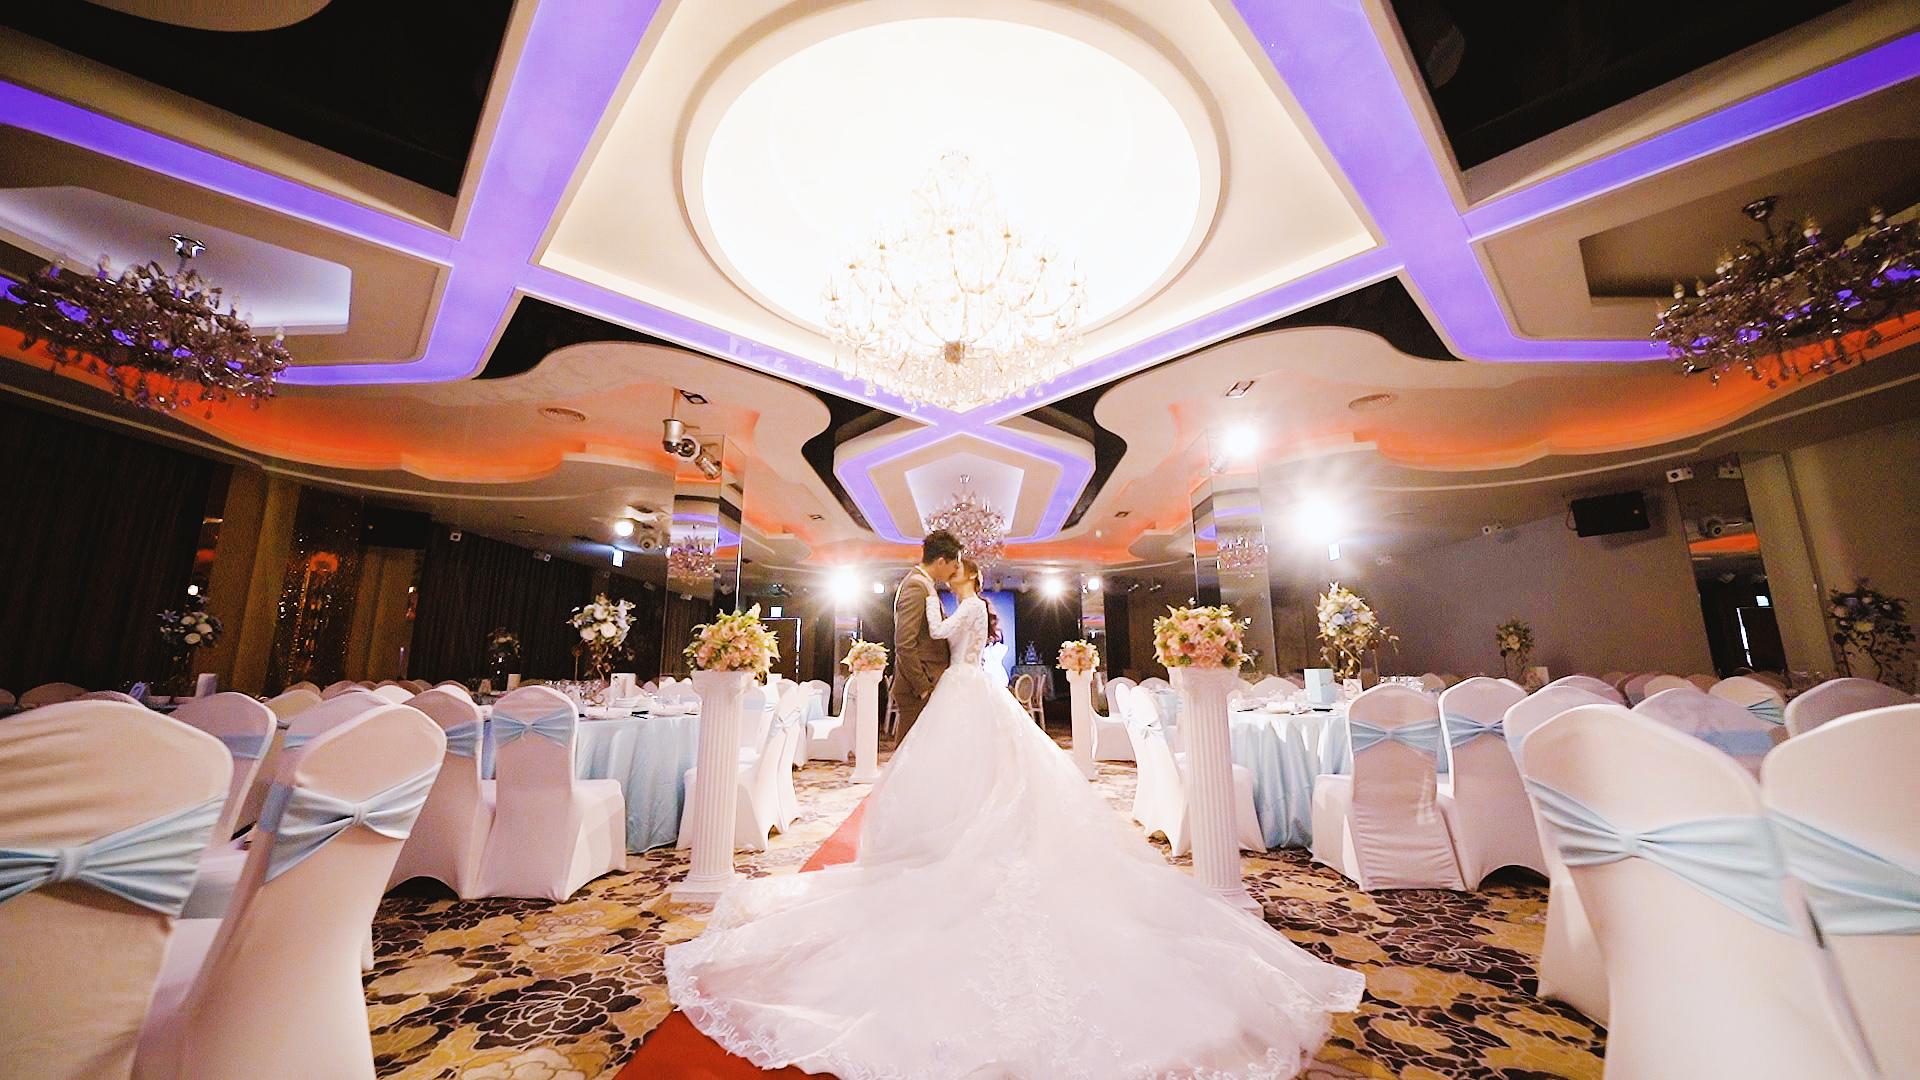 Roy & Mi Wedding Mv 青青格麗絲莊園-v.00_03_30_23.Still002